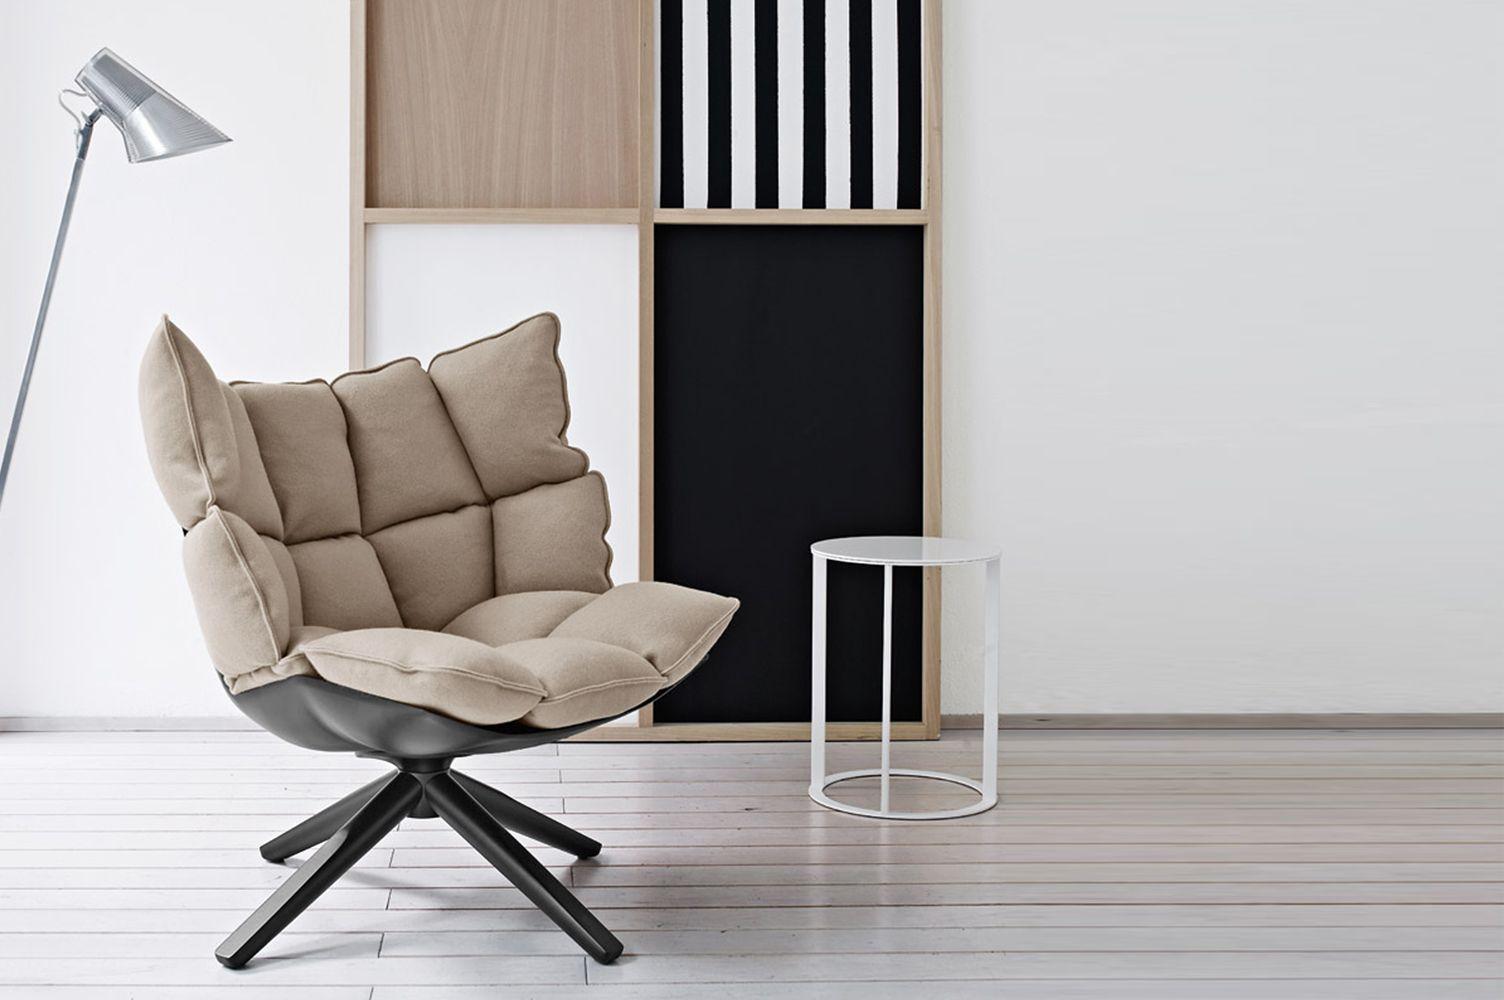 Husk Chair By Patricia Urquiola Furniture Furniture Design Armchair Furniture